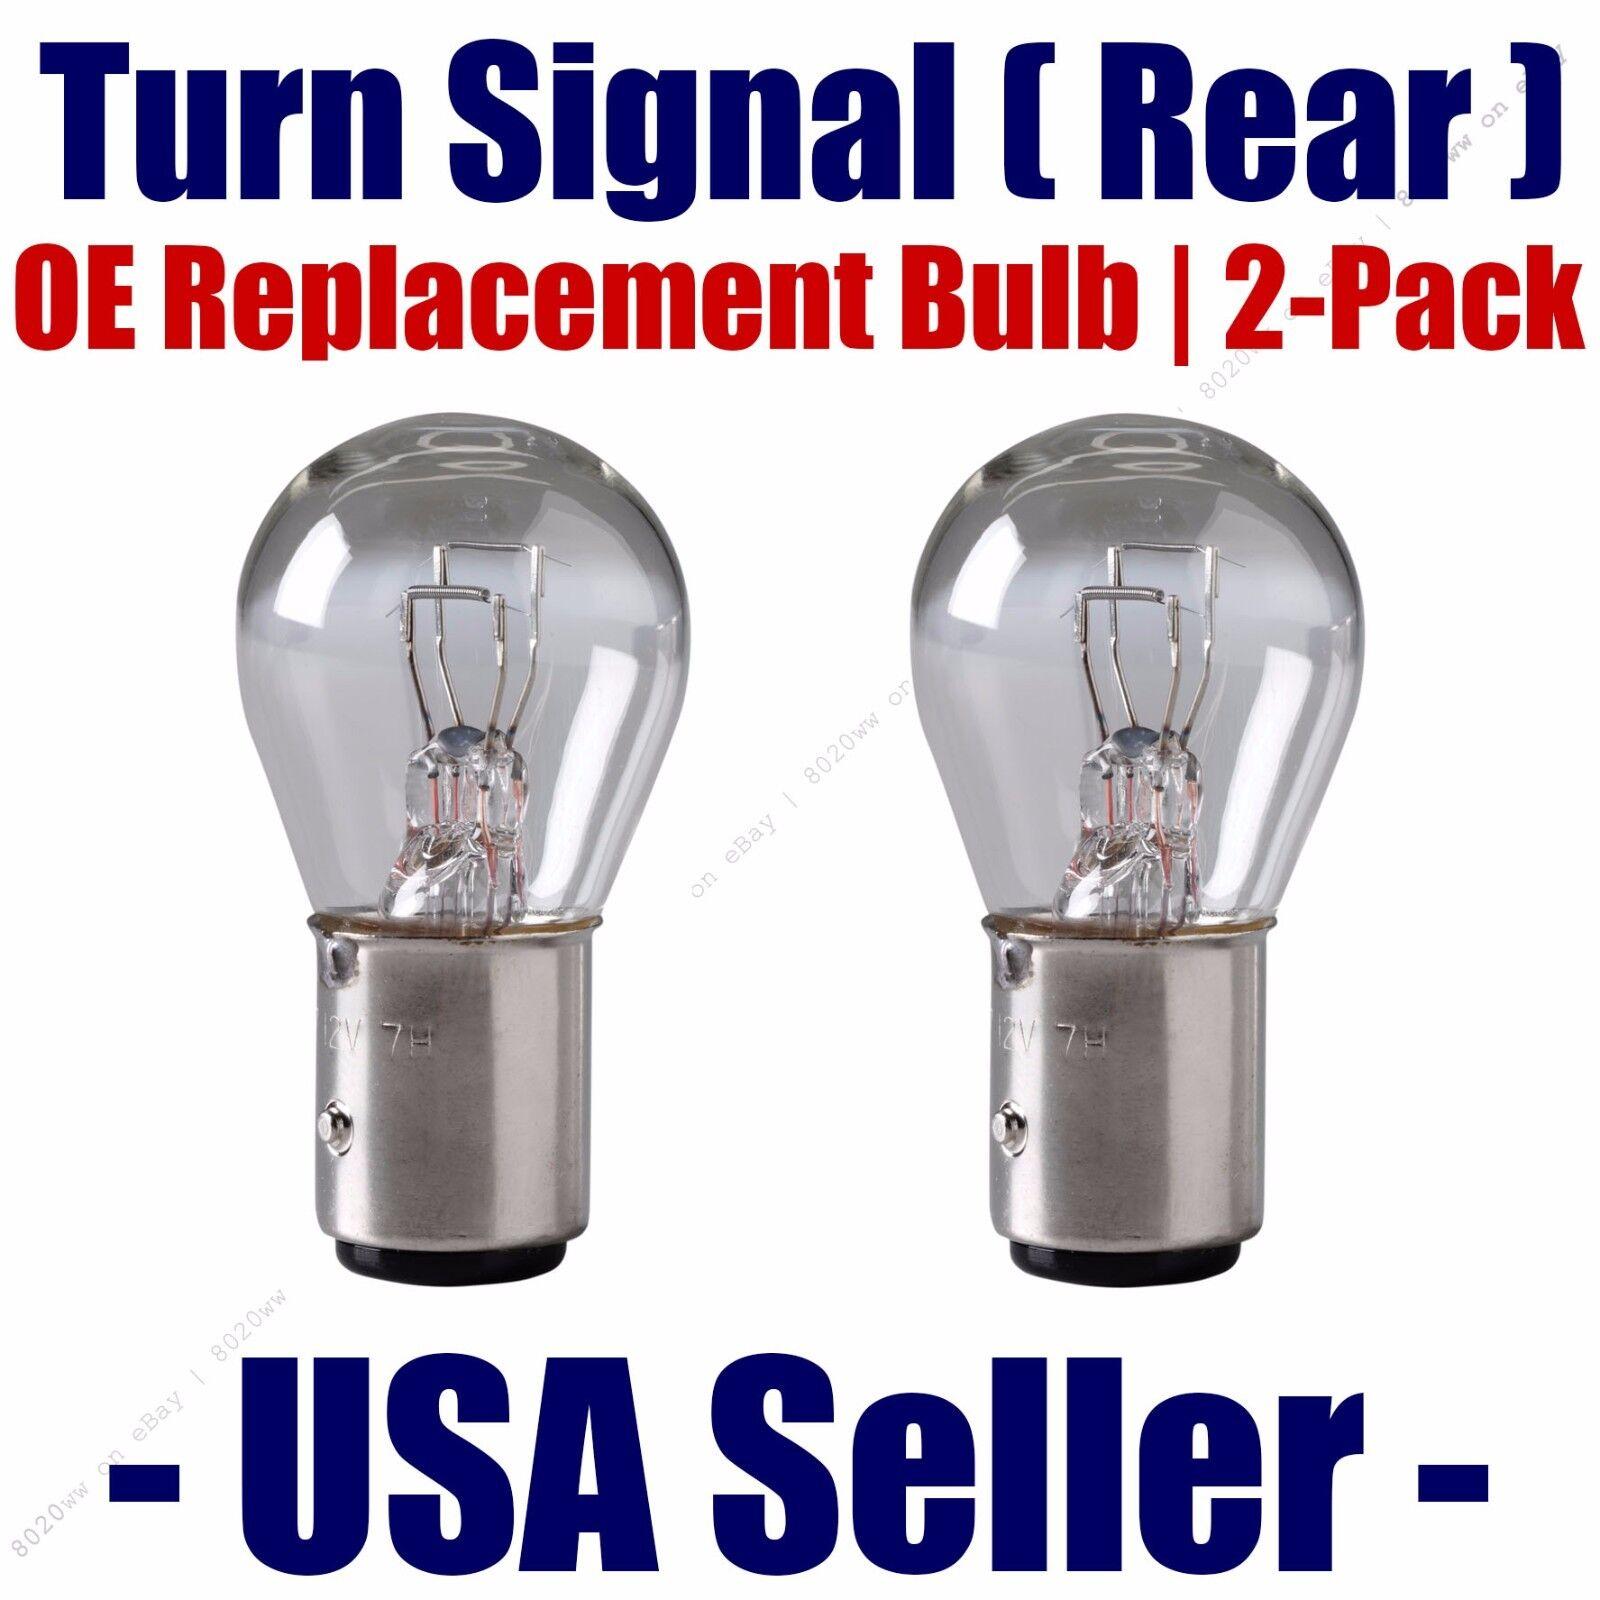 Rear Turn Signal Light Bulb 2pk - Fits Listed AMC Vehicles - 1034